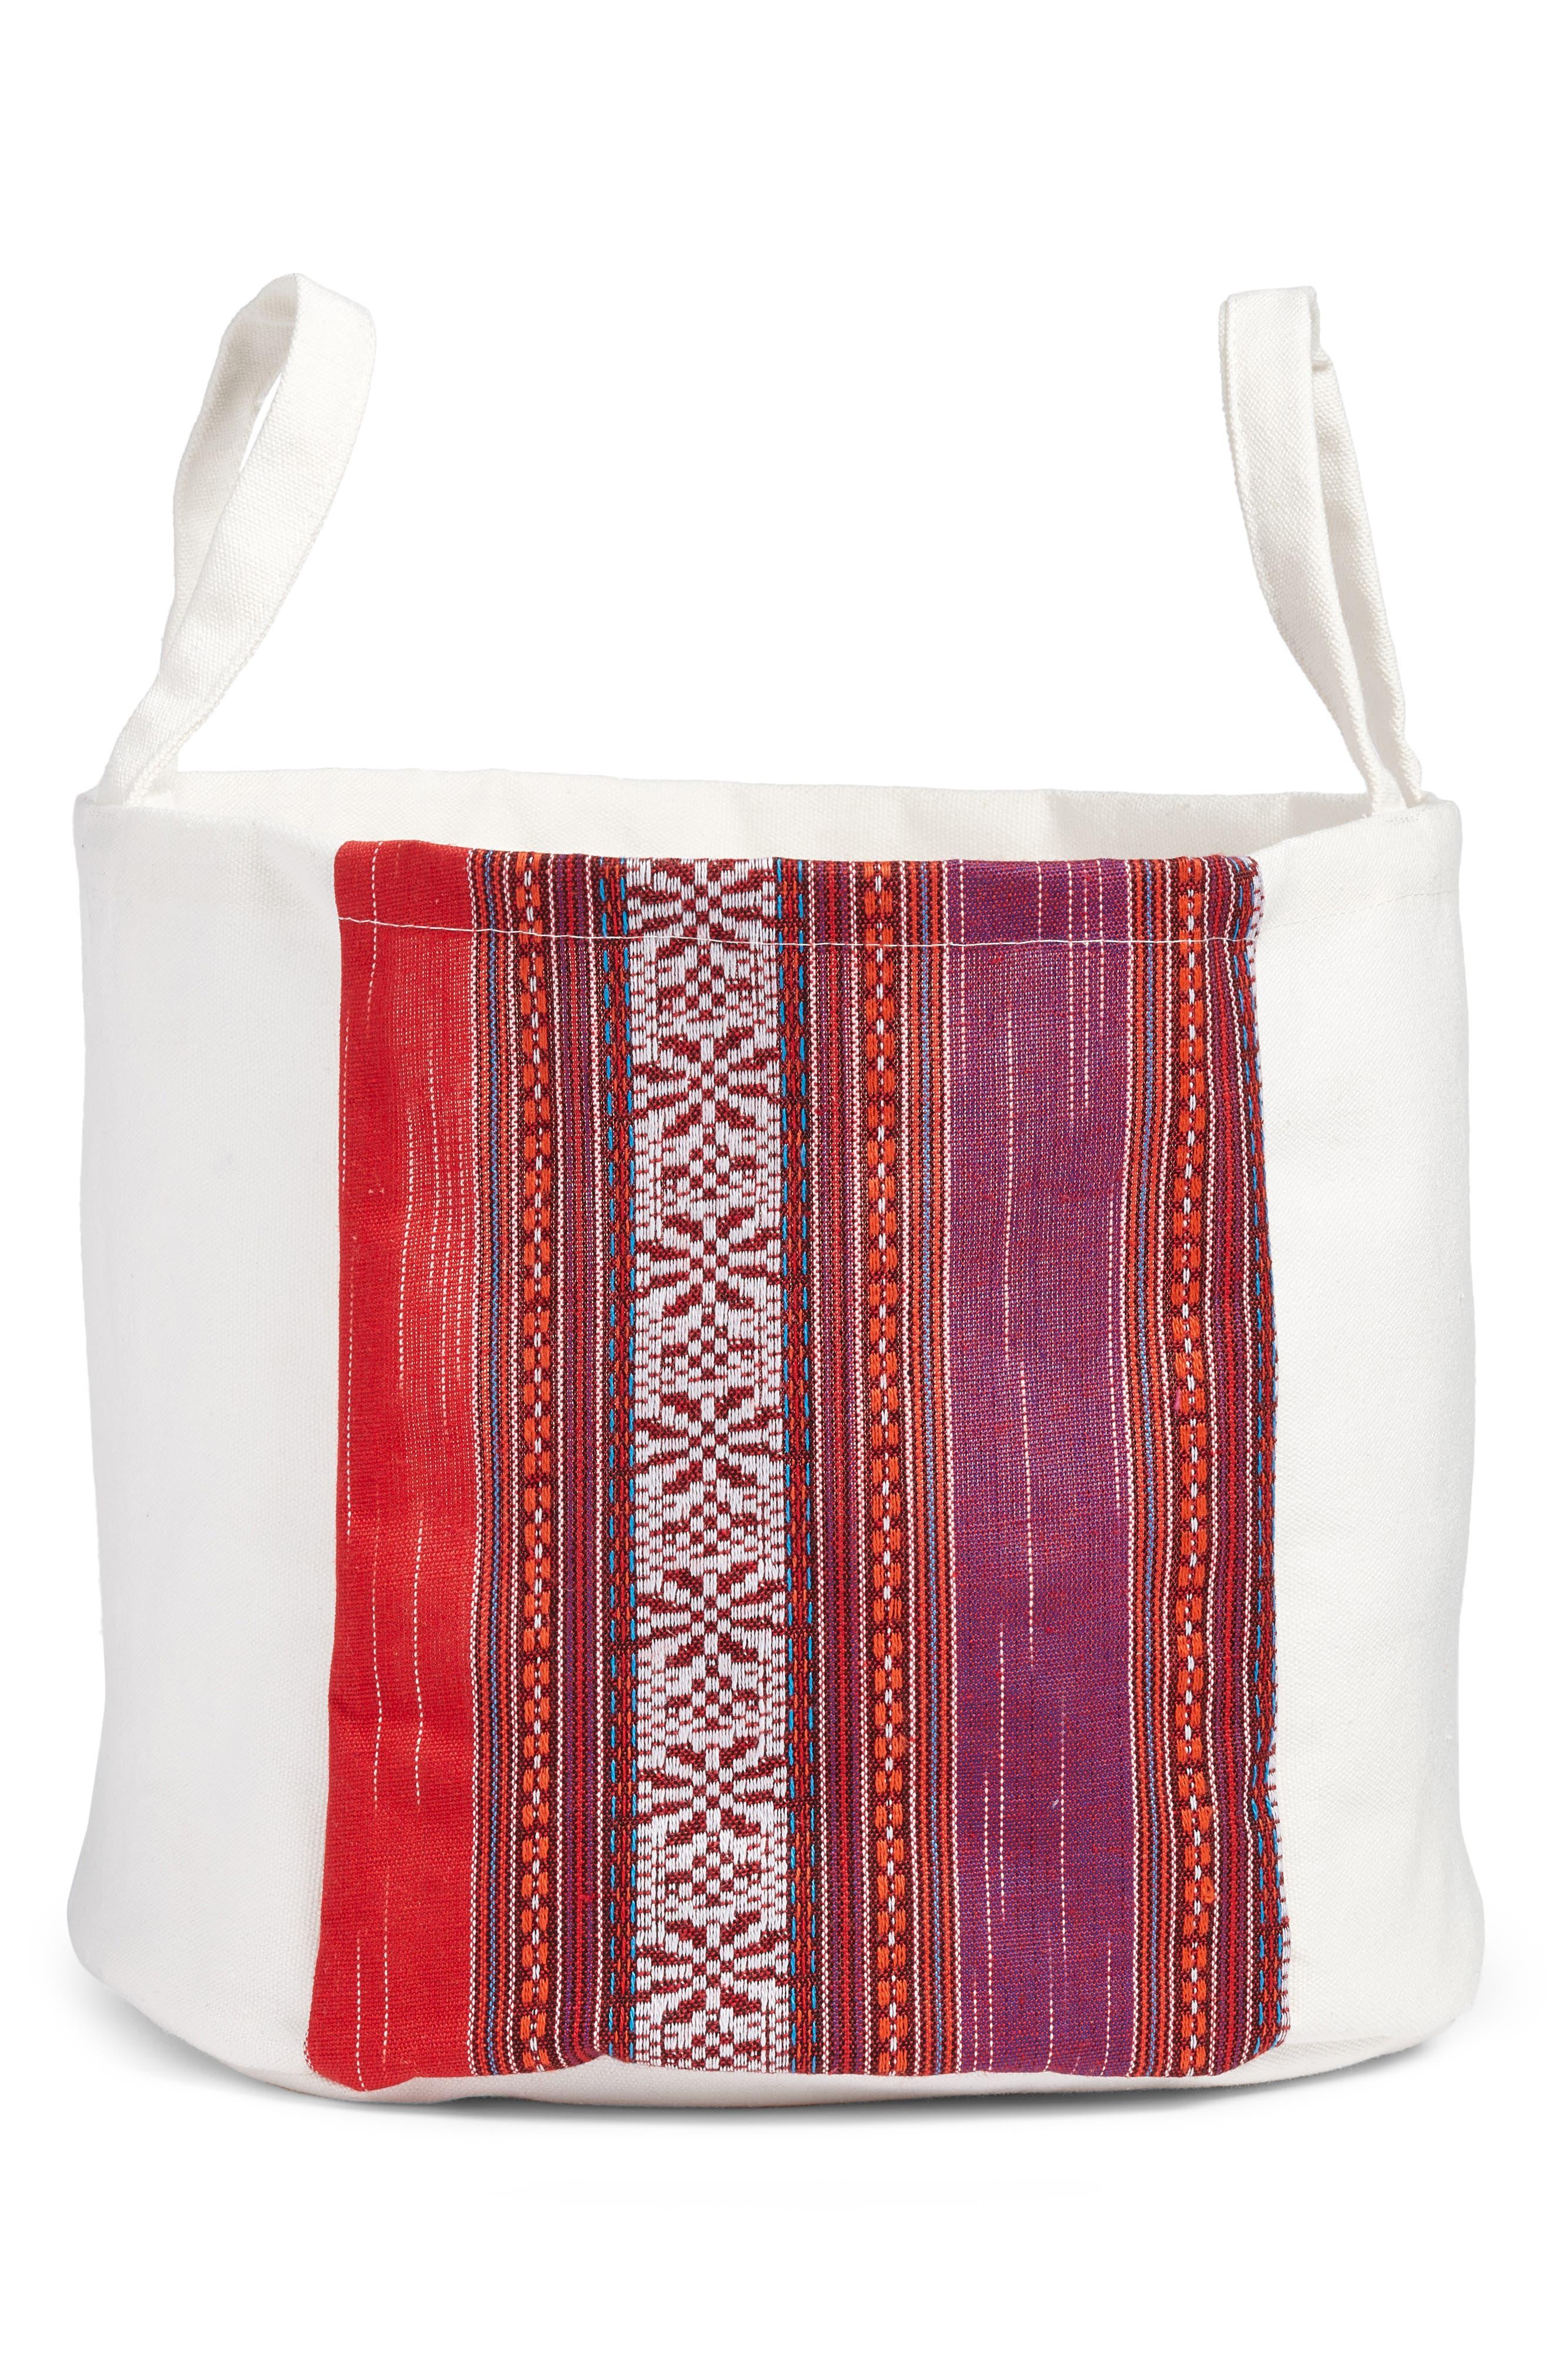 Levex Boho Canvas Basket,                         Main,                         color, 901